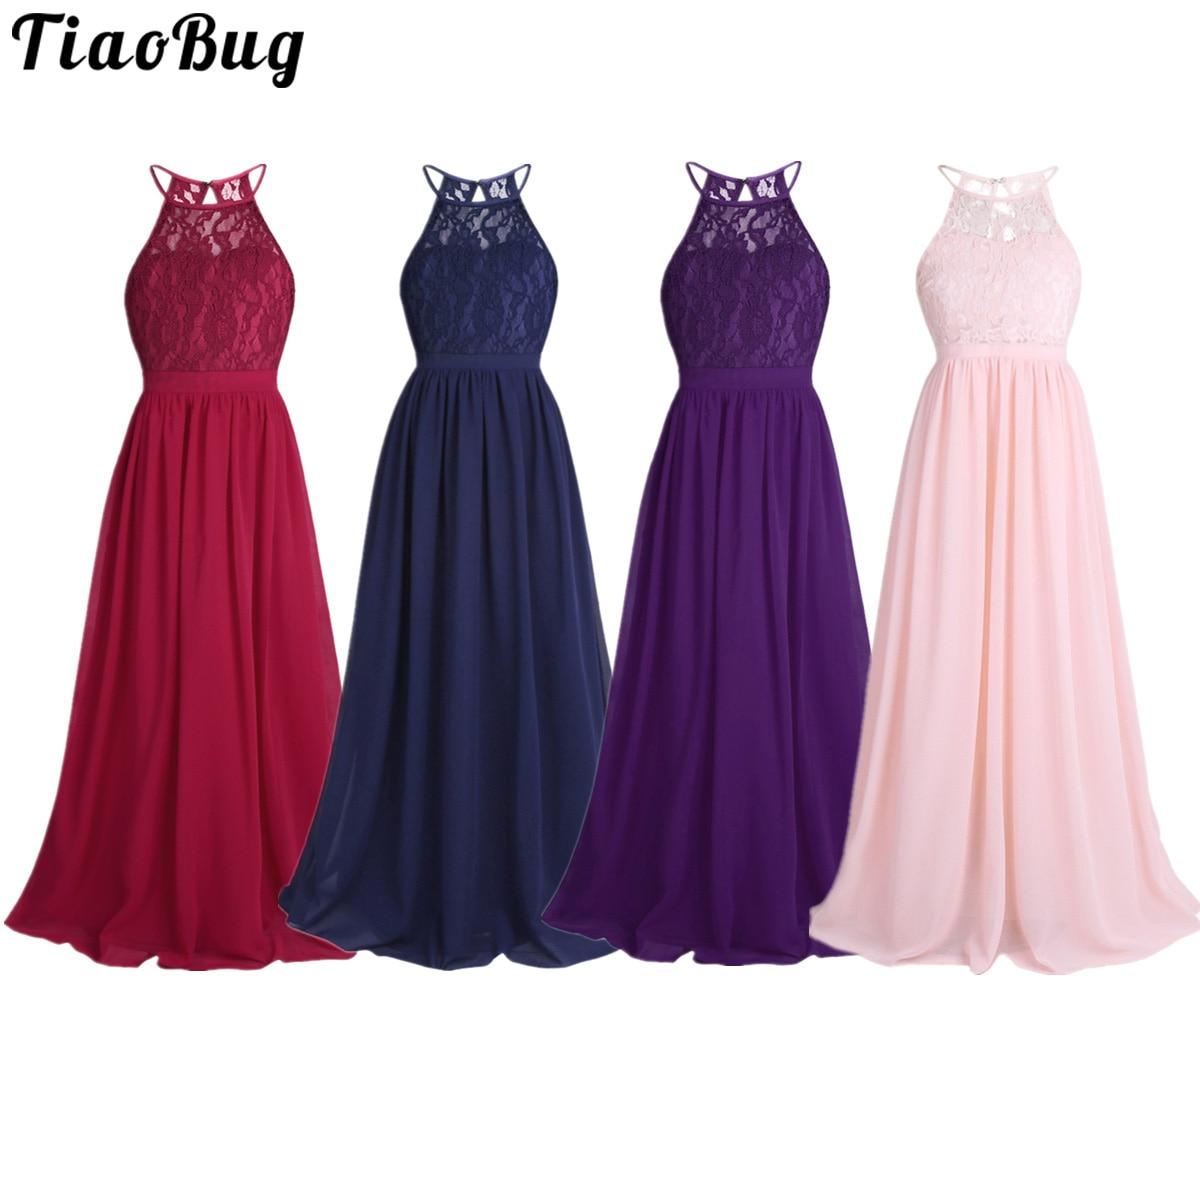 Girls Lace Chiffon Sleeveless Halter Flower Girl Dress Princess For Pageant Wedding Bridesmaid Birth